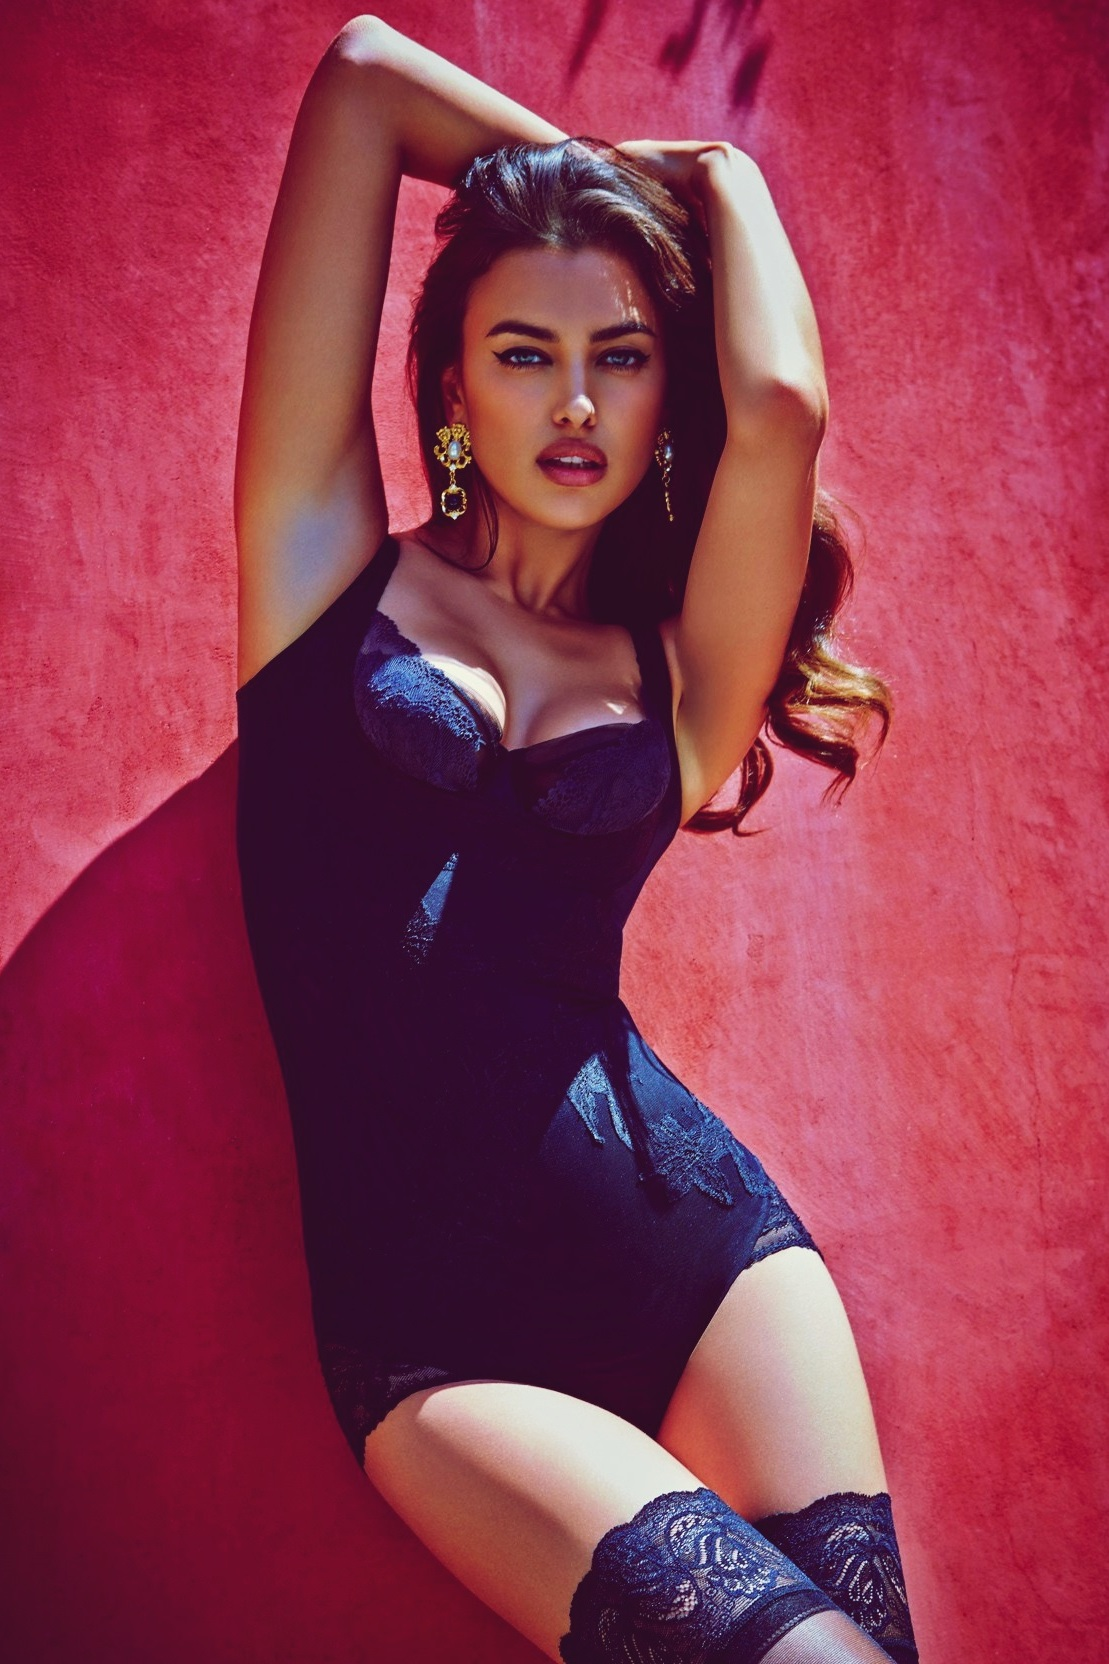 sexy girl irina shayk model attractive pretty adult clothing swimsuit hair fashion